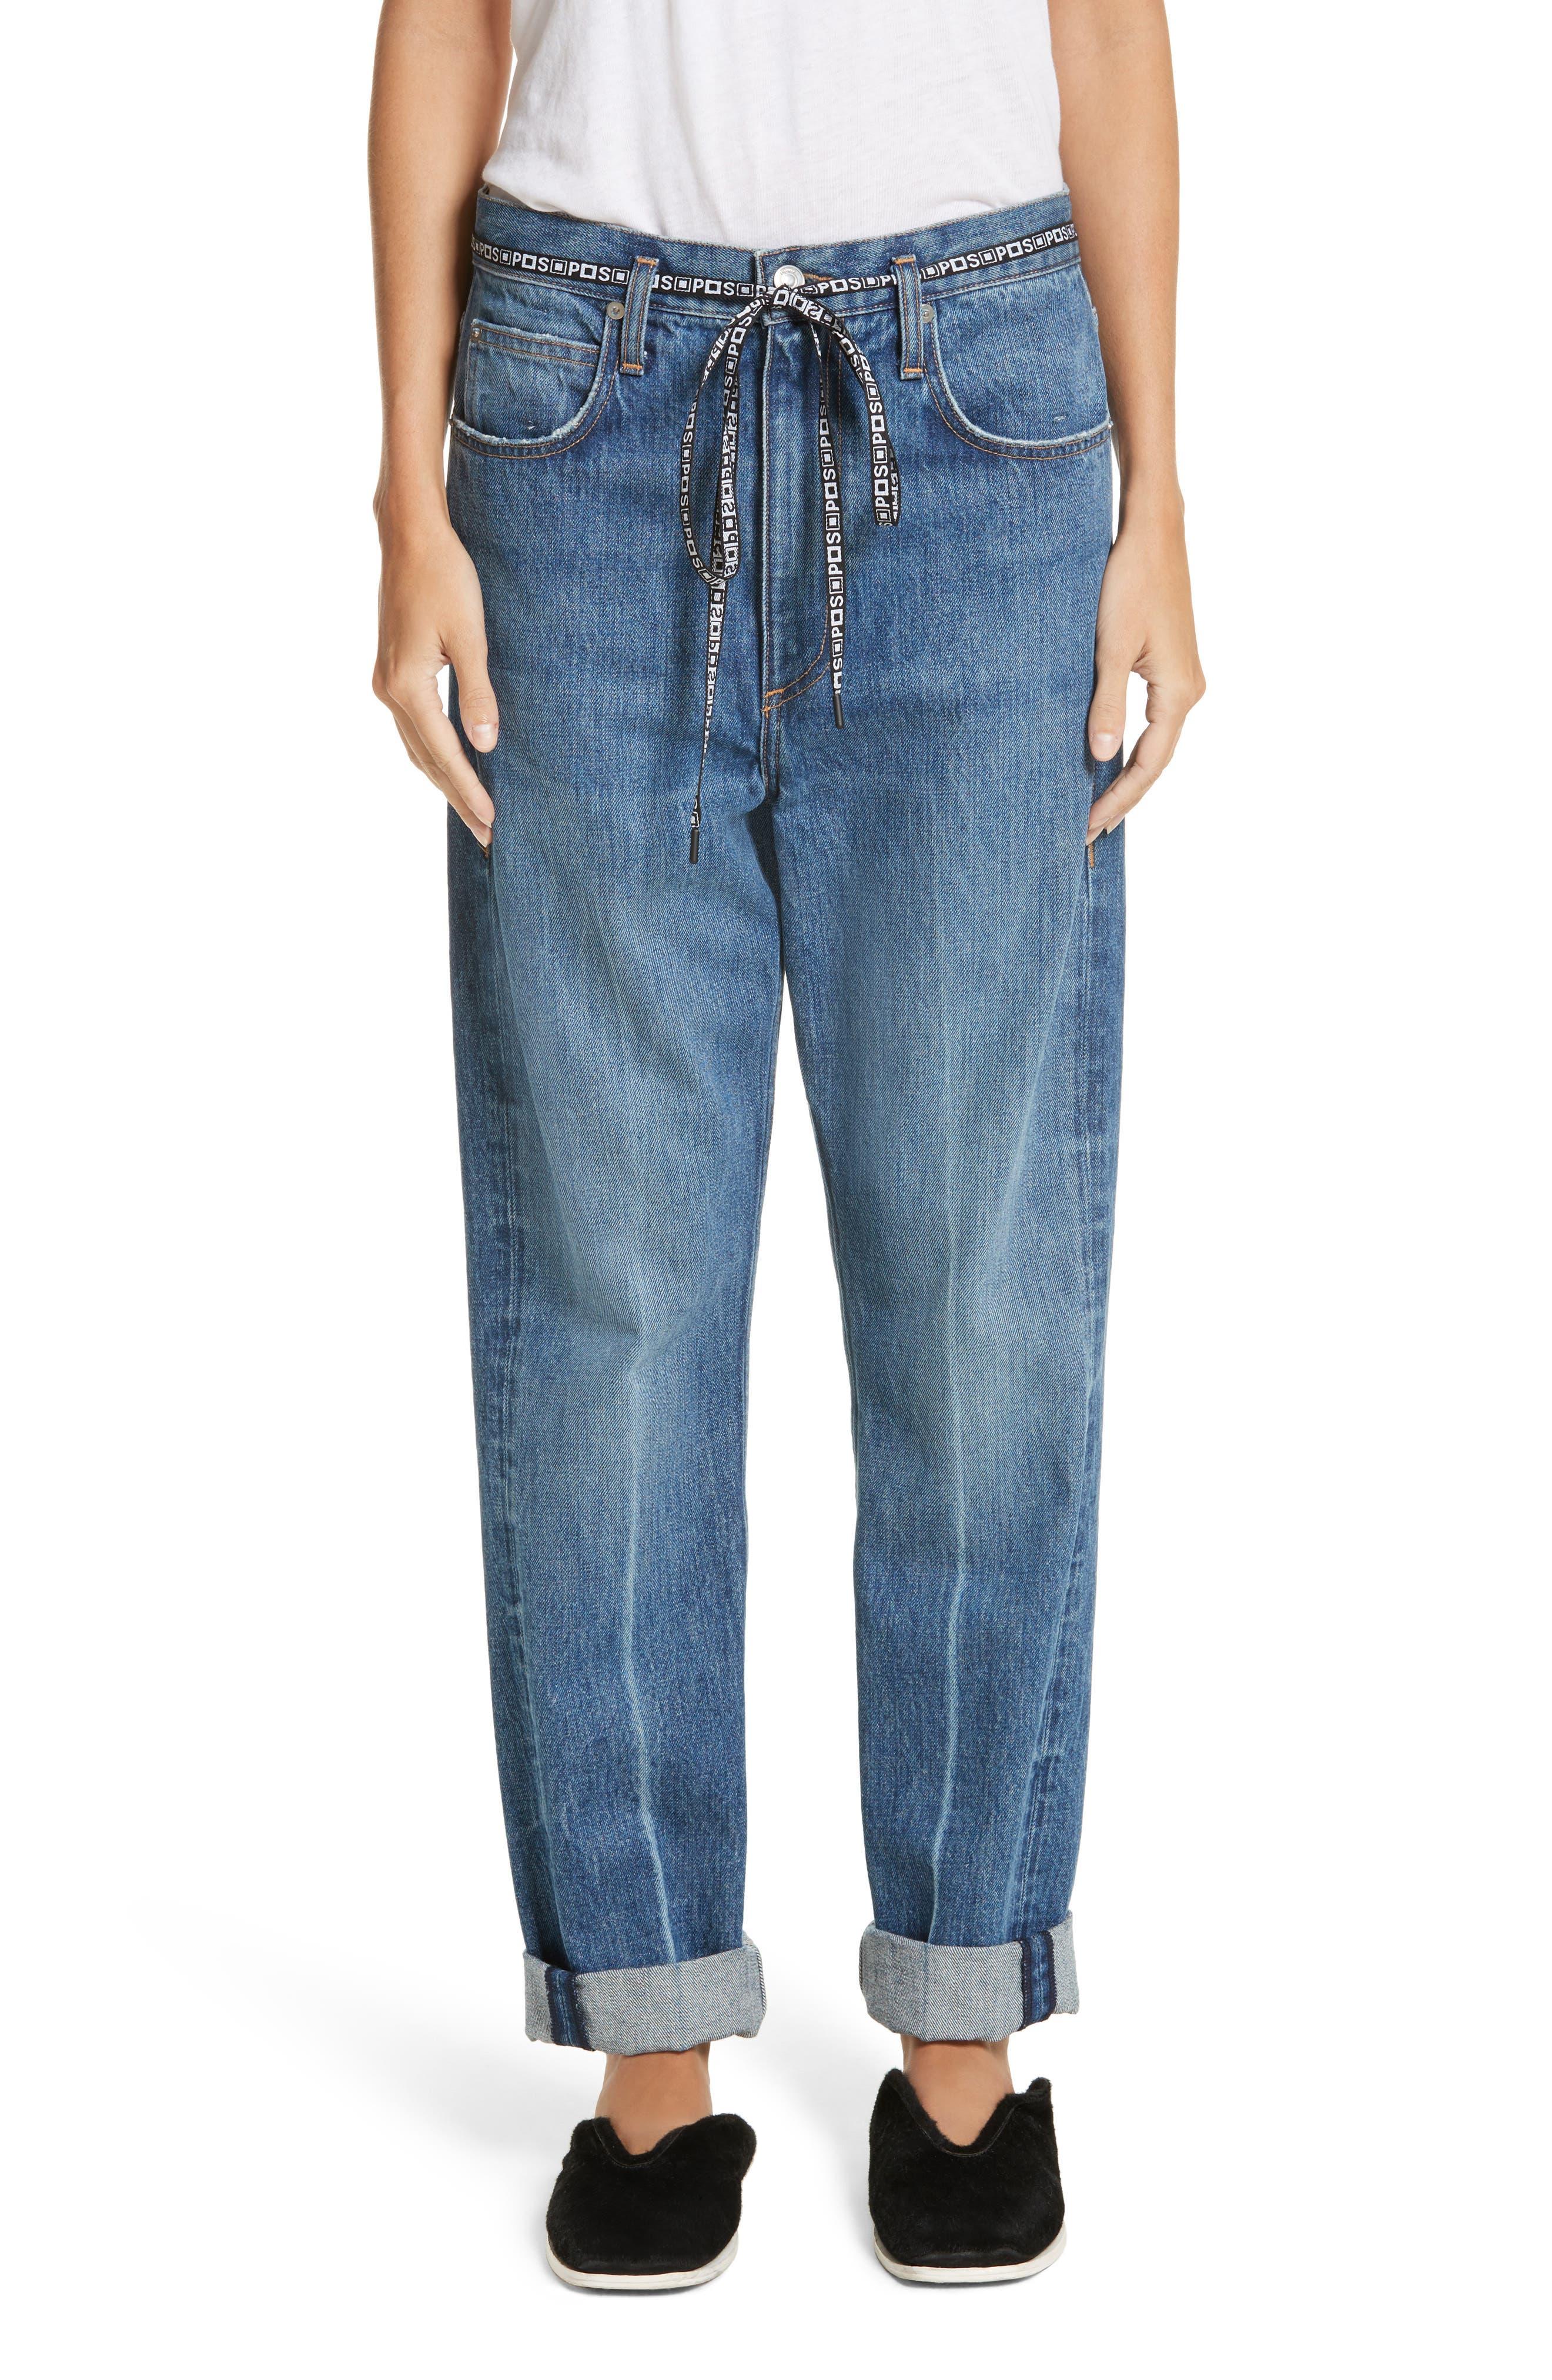 Main Image - Proenza Schouler PSWL Cuffed Straight Leg Jeans